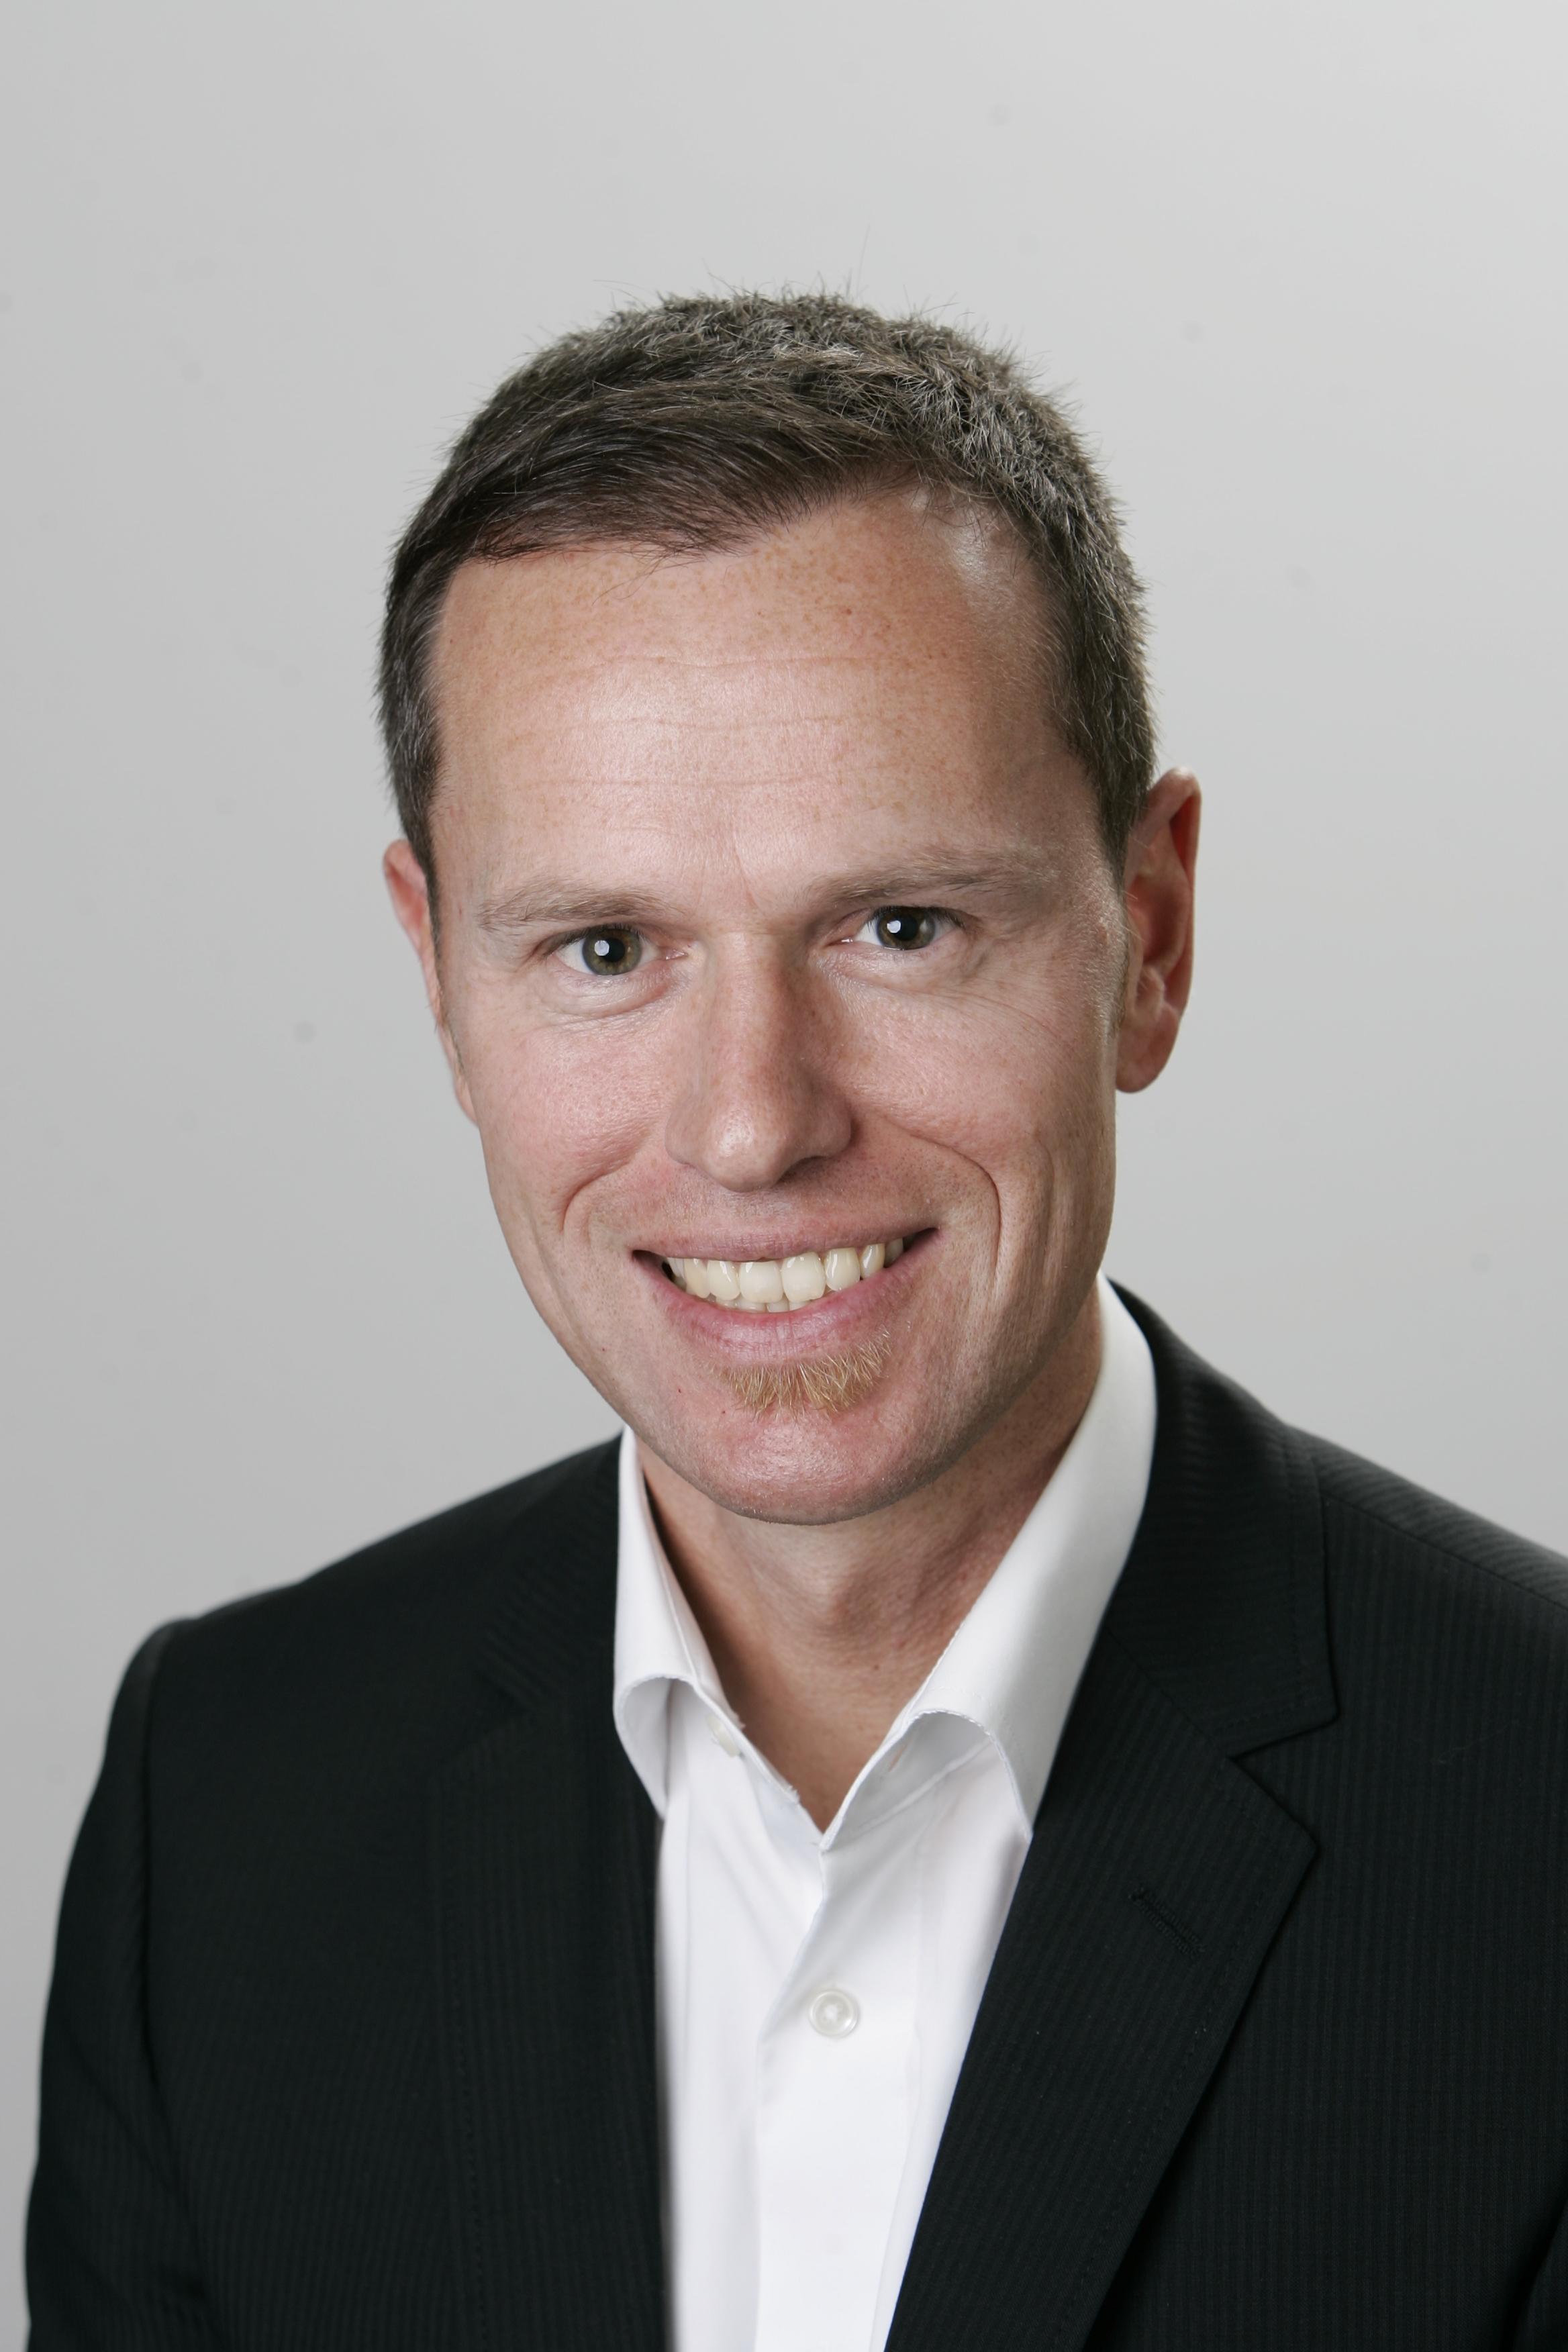 Markus Hauke